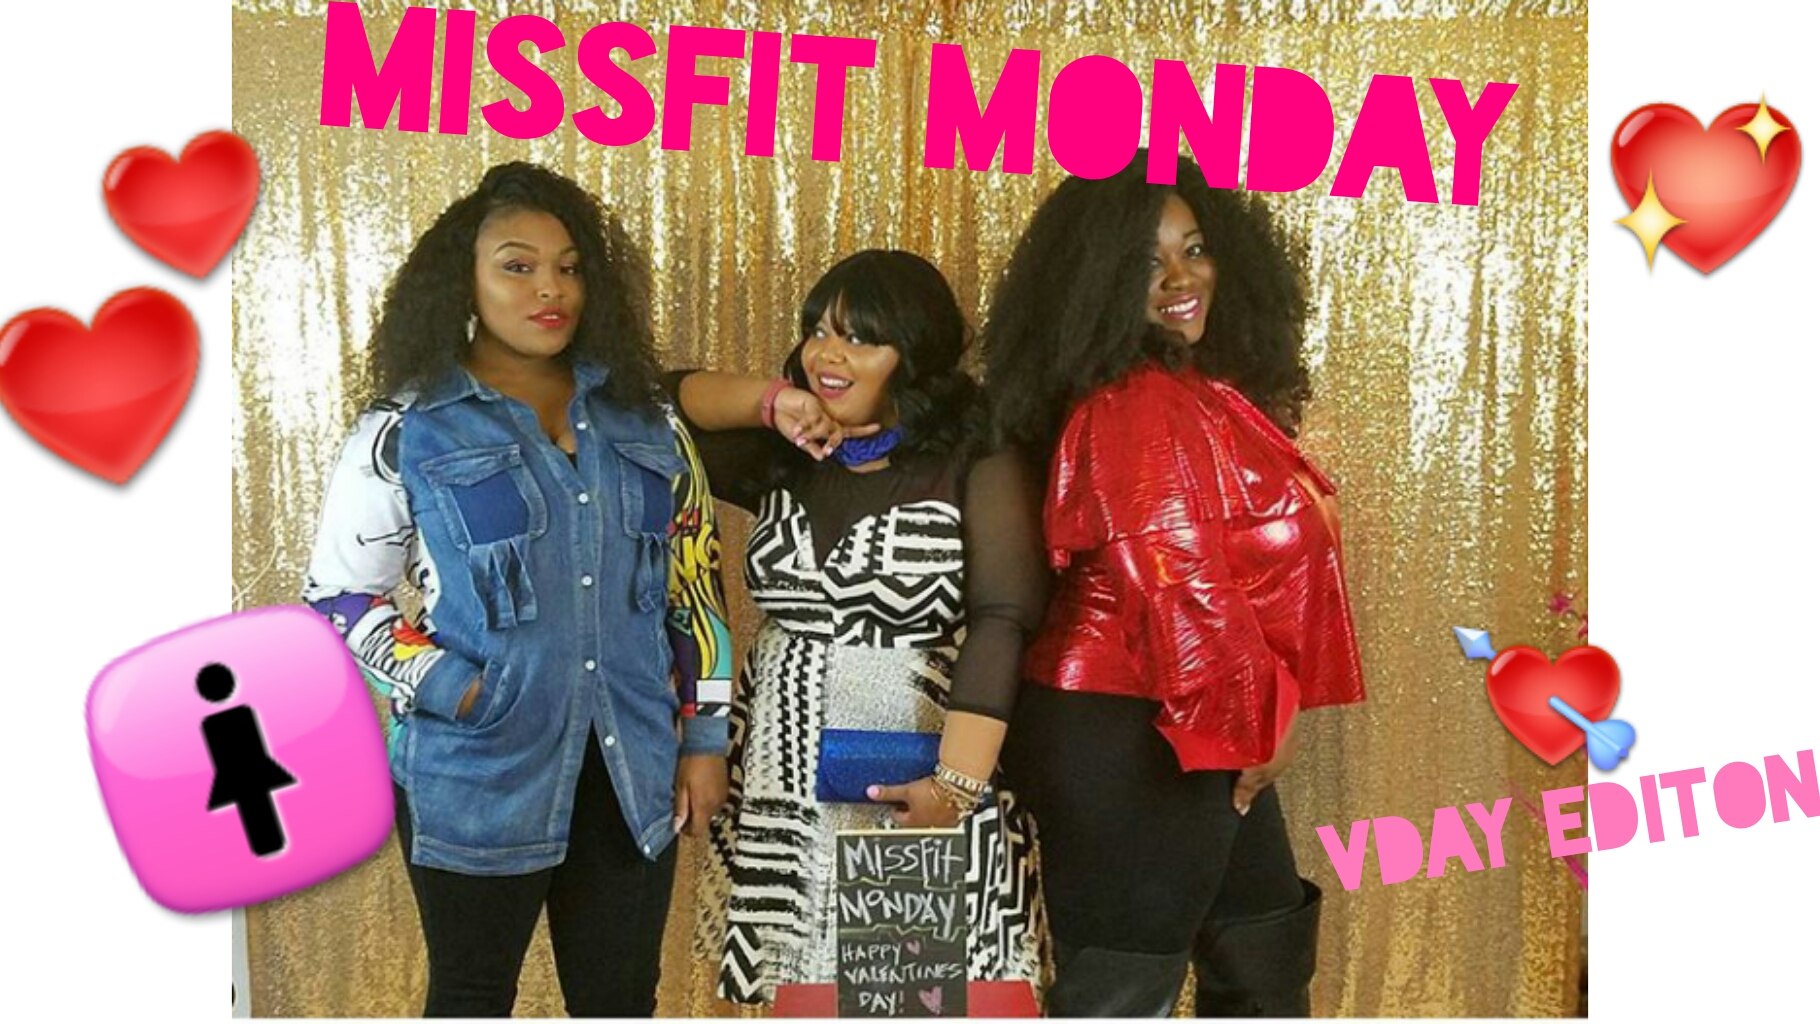 MISSFIT MONDAY